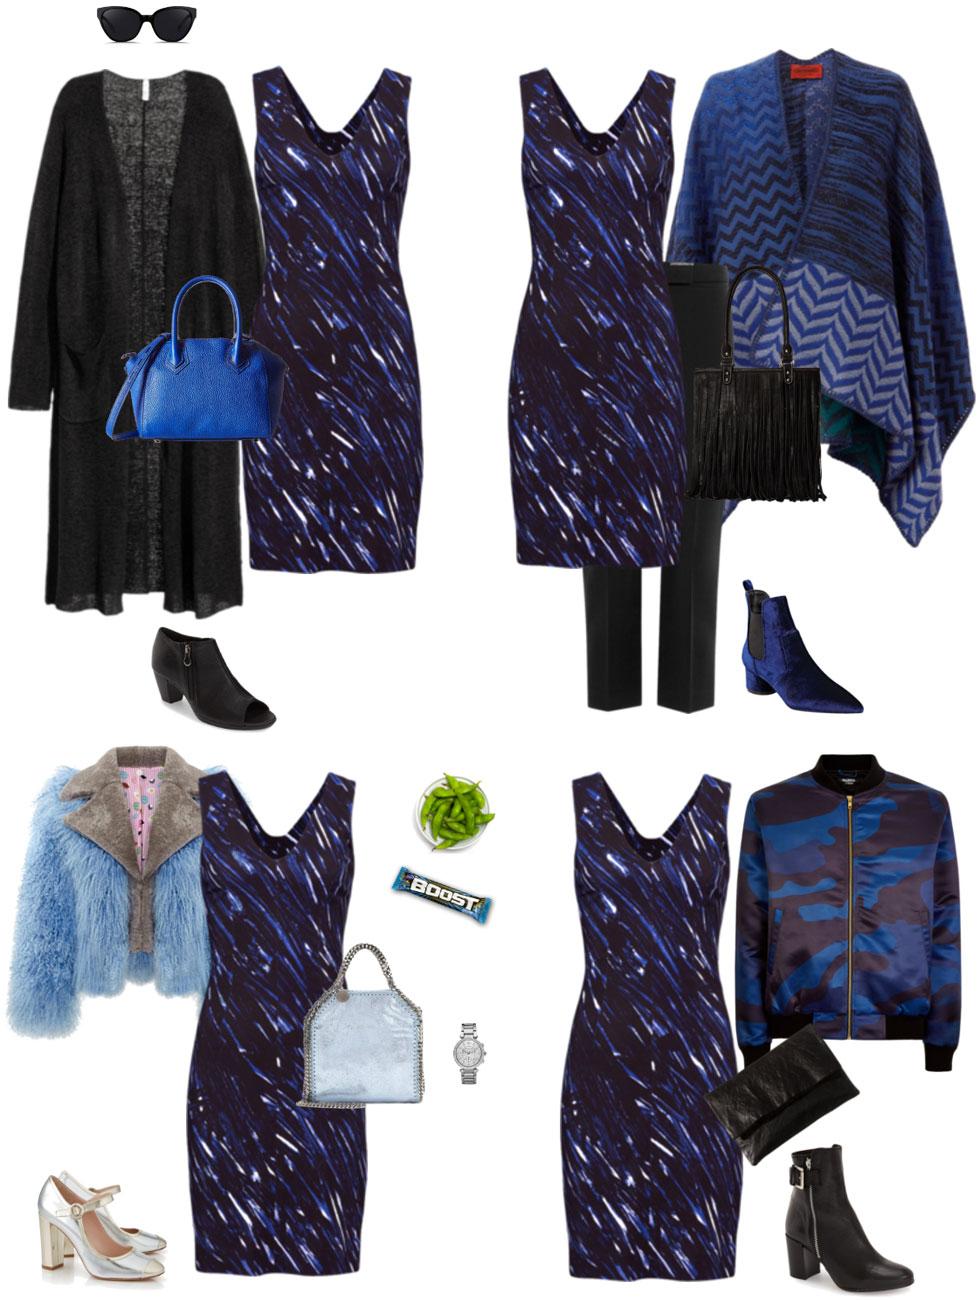 Ensemble: Transition a Sheath Dress into Fall